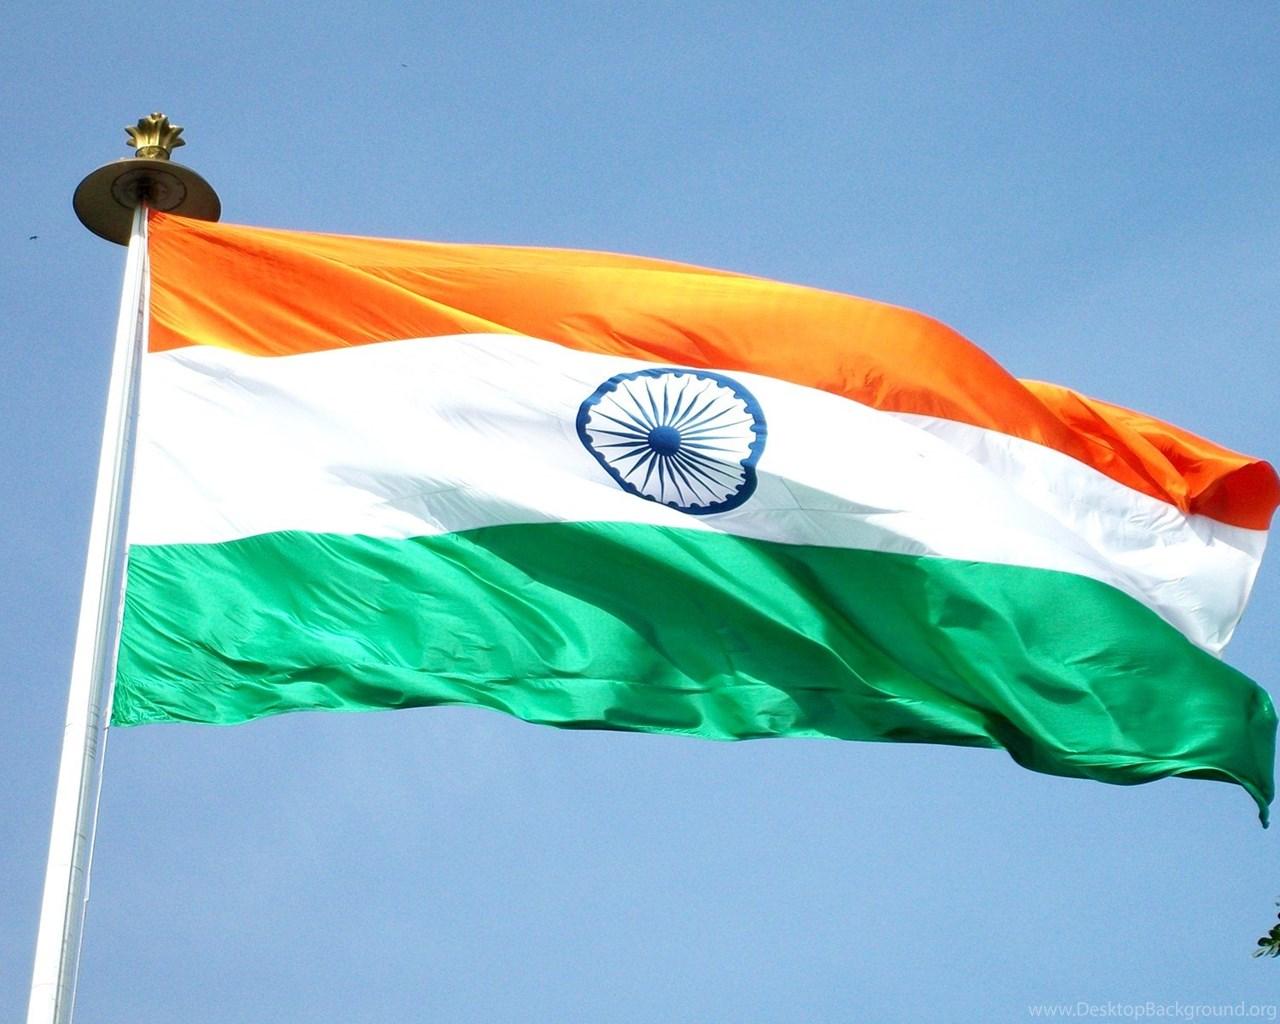 Indian Flag Hd Wallpaper 1080p: Indian Flag Wallpapers 1080p For Desktop Backgrounds